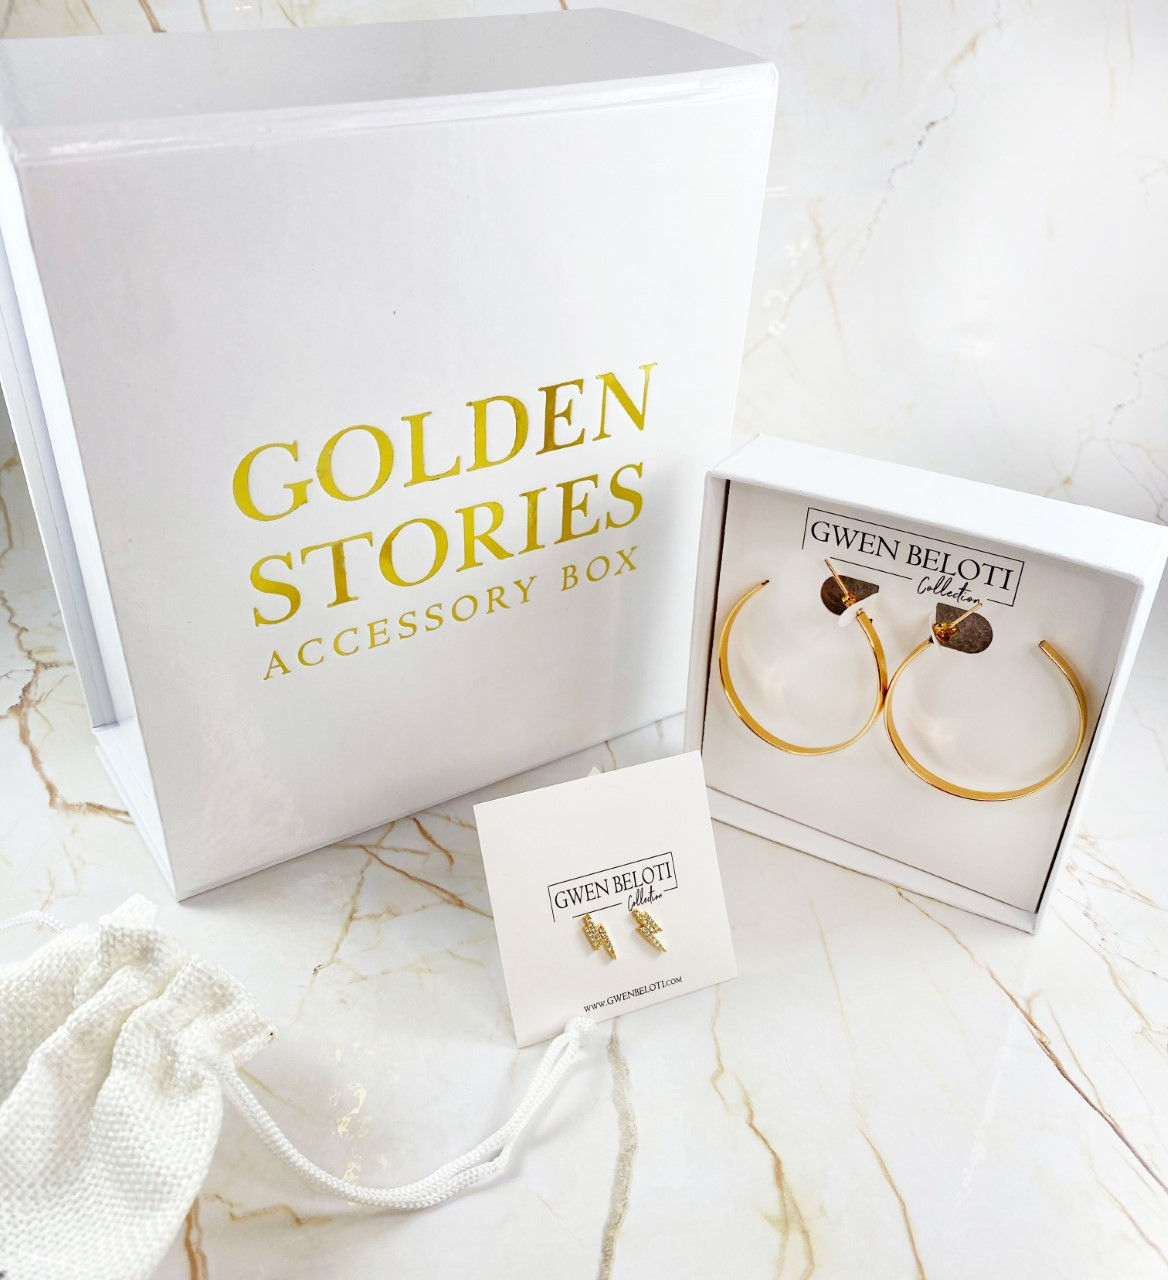 Golden Stories Accessory Box